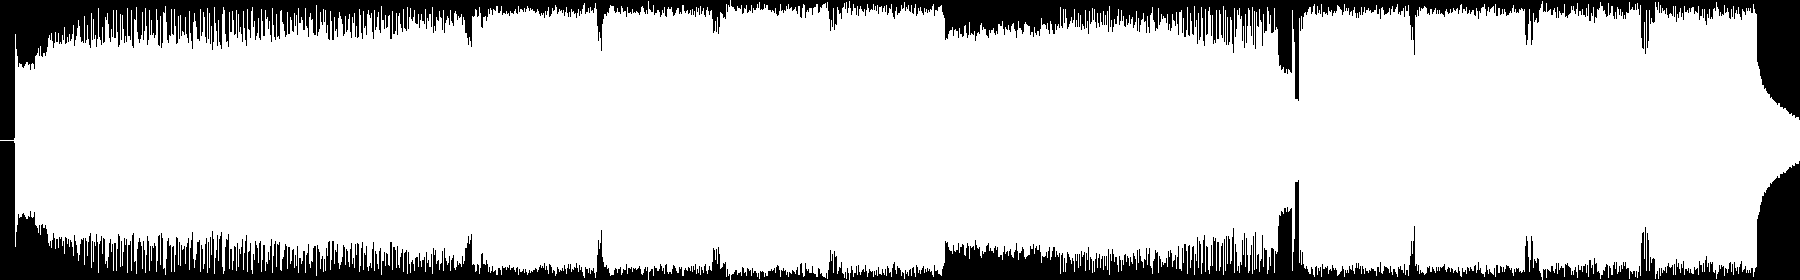 FL Studio Future Bass Template audio waveform